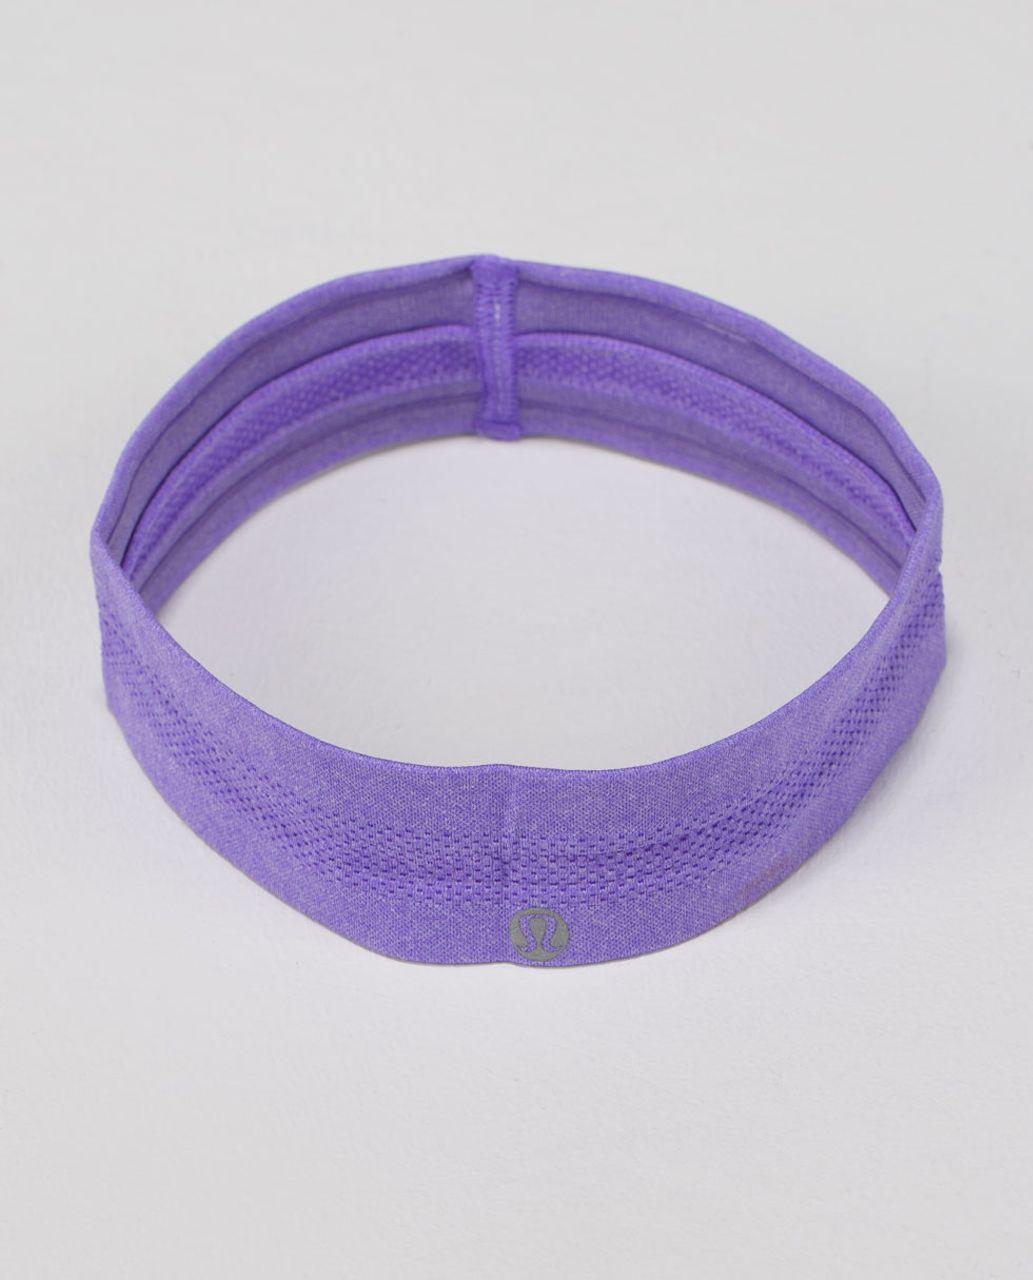 Lululemon Swiftly Headband - Heathered Power Purple